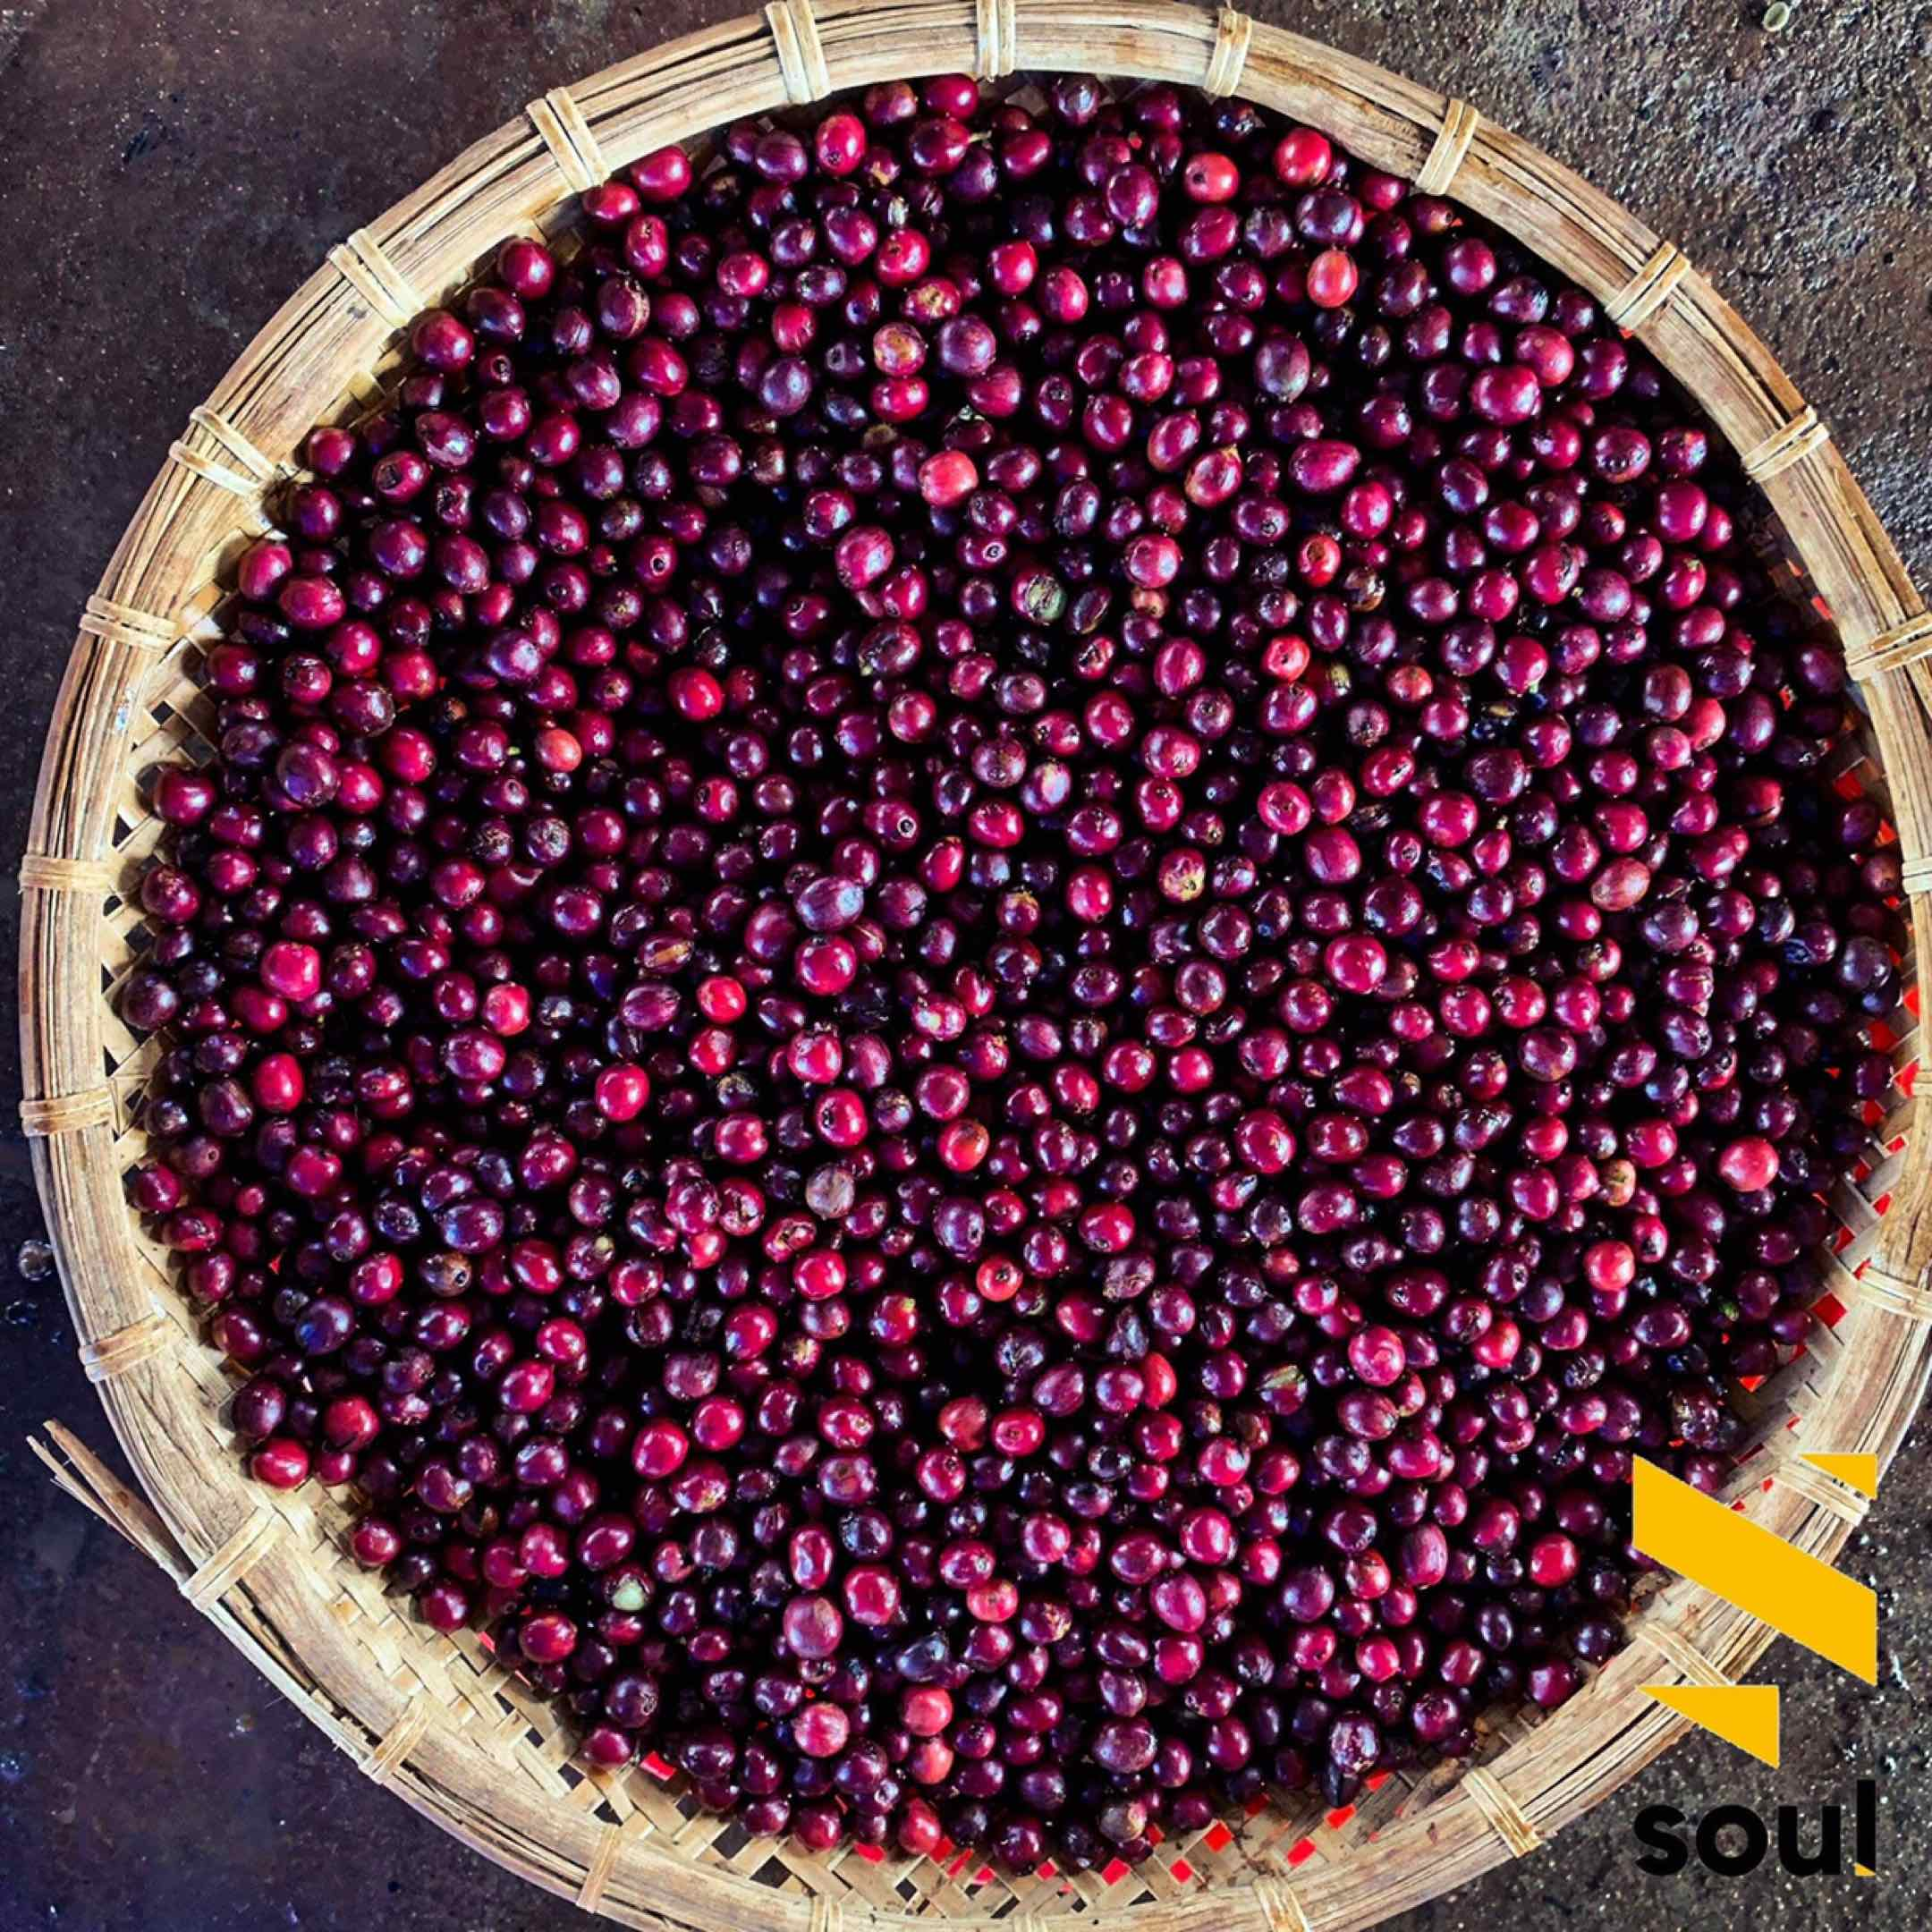 Soul of Vietnam coffee